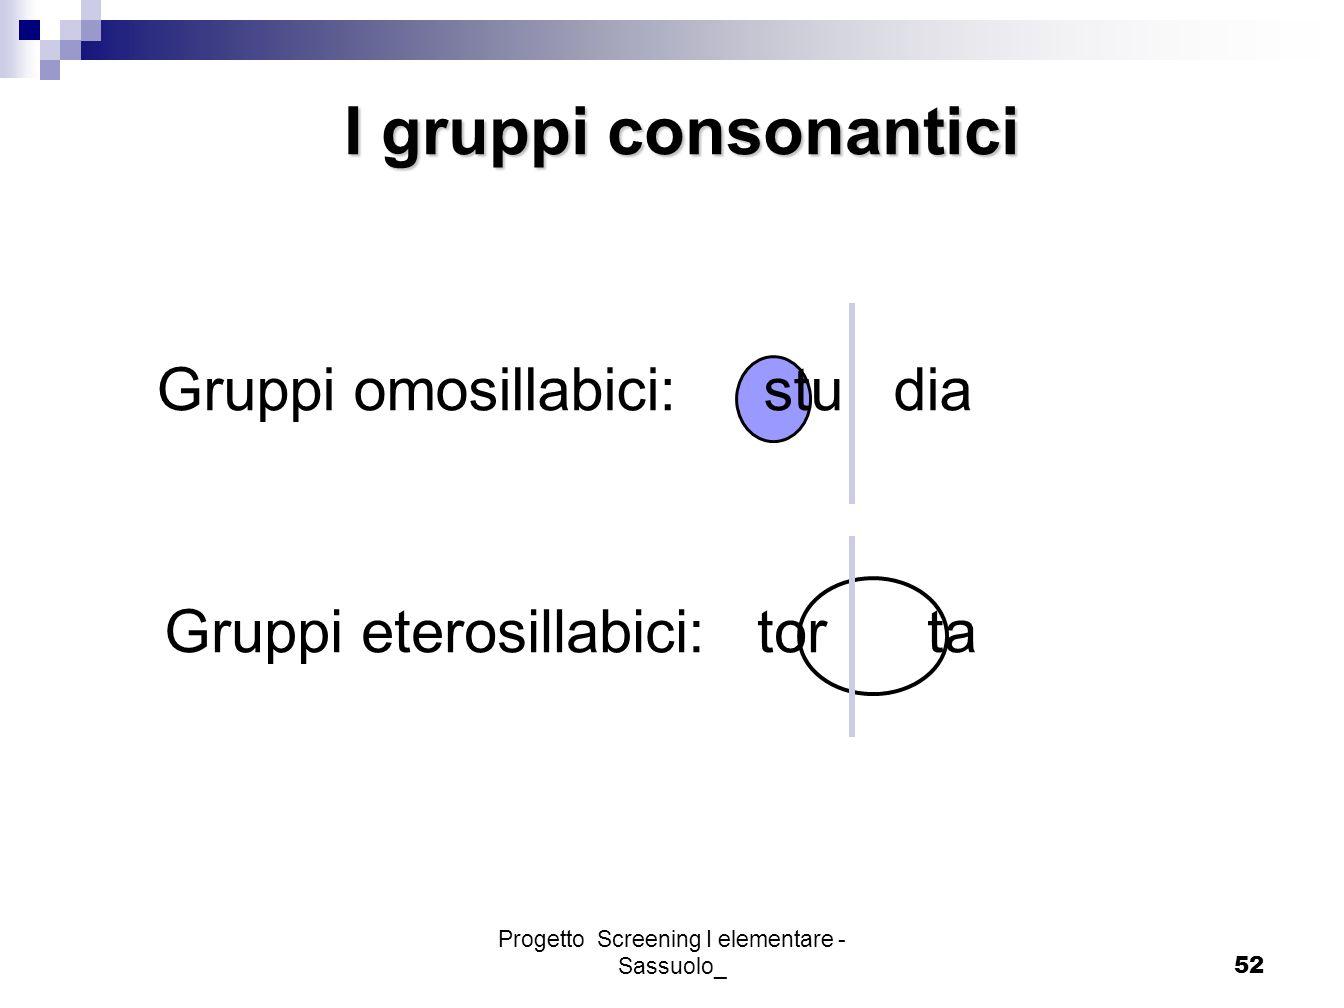 Progetto Screening I elementare - Sassuolo_52 I gruppi consonantici Gruppi omosillabici: stu dia Gruppi eterosillabici: tor ta